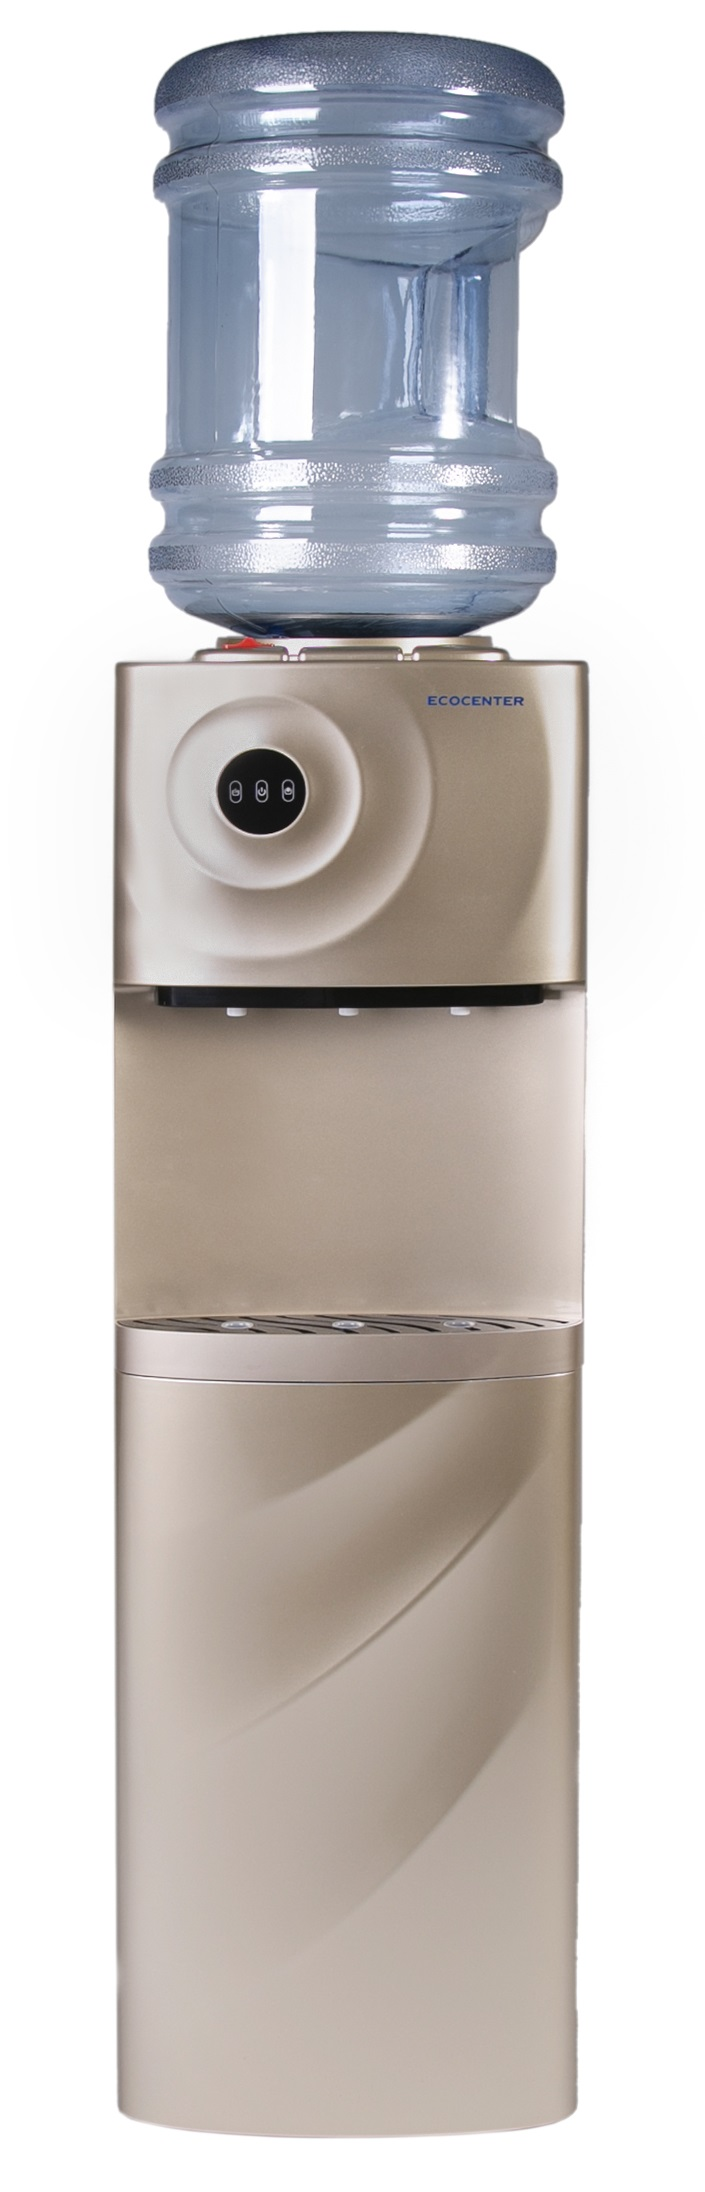 Кулер для воды ECOCENTER A-F510C gold